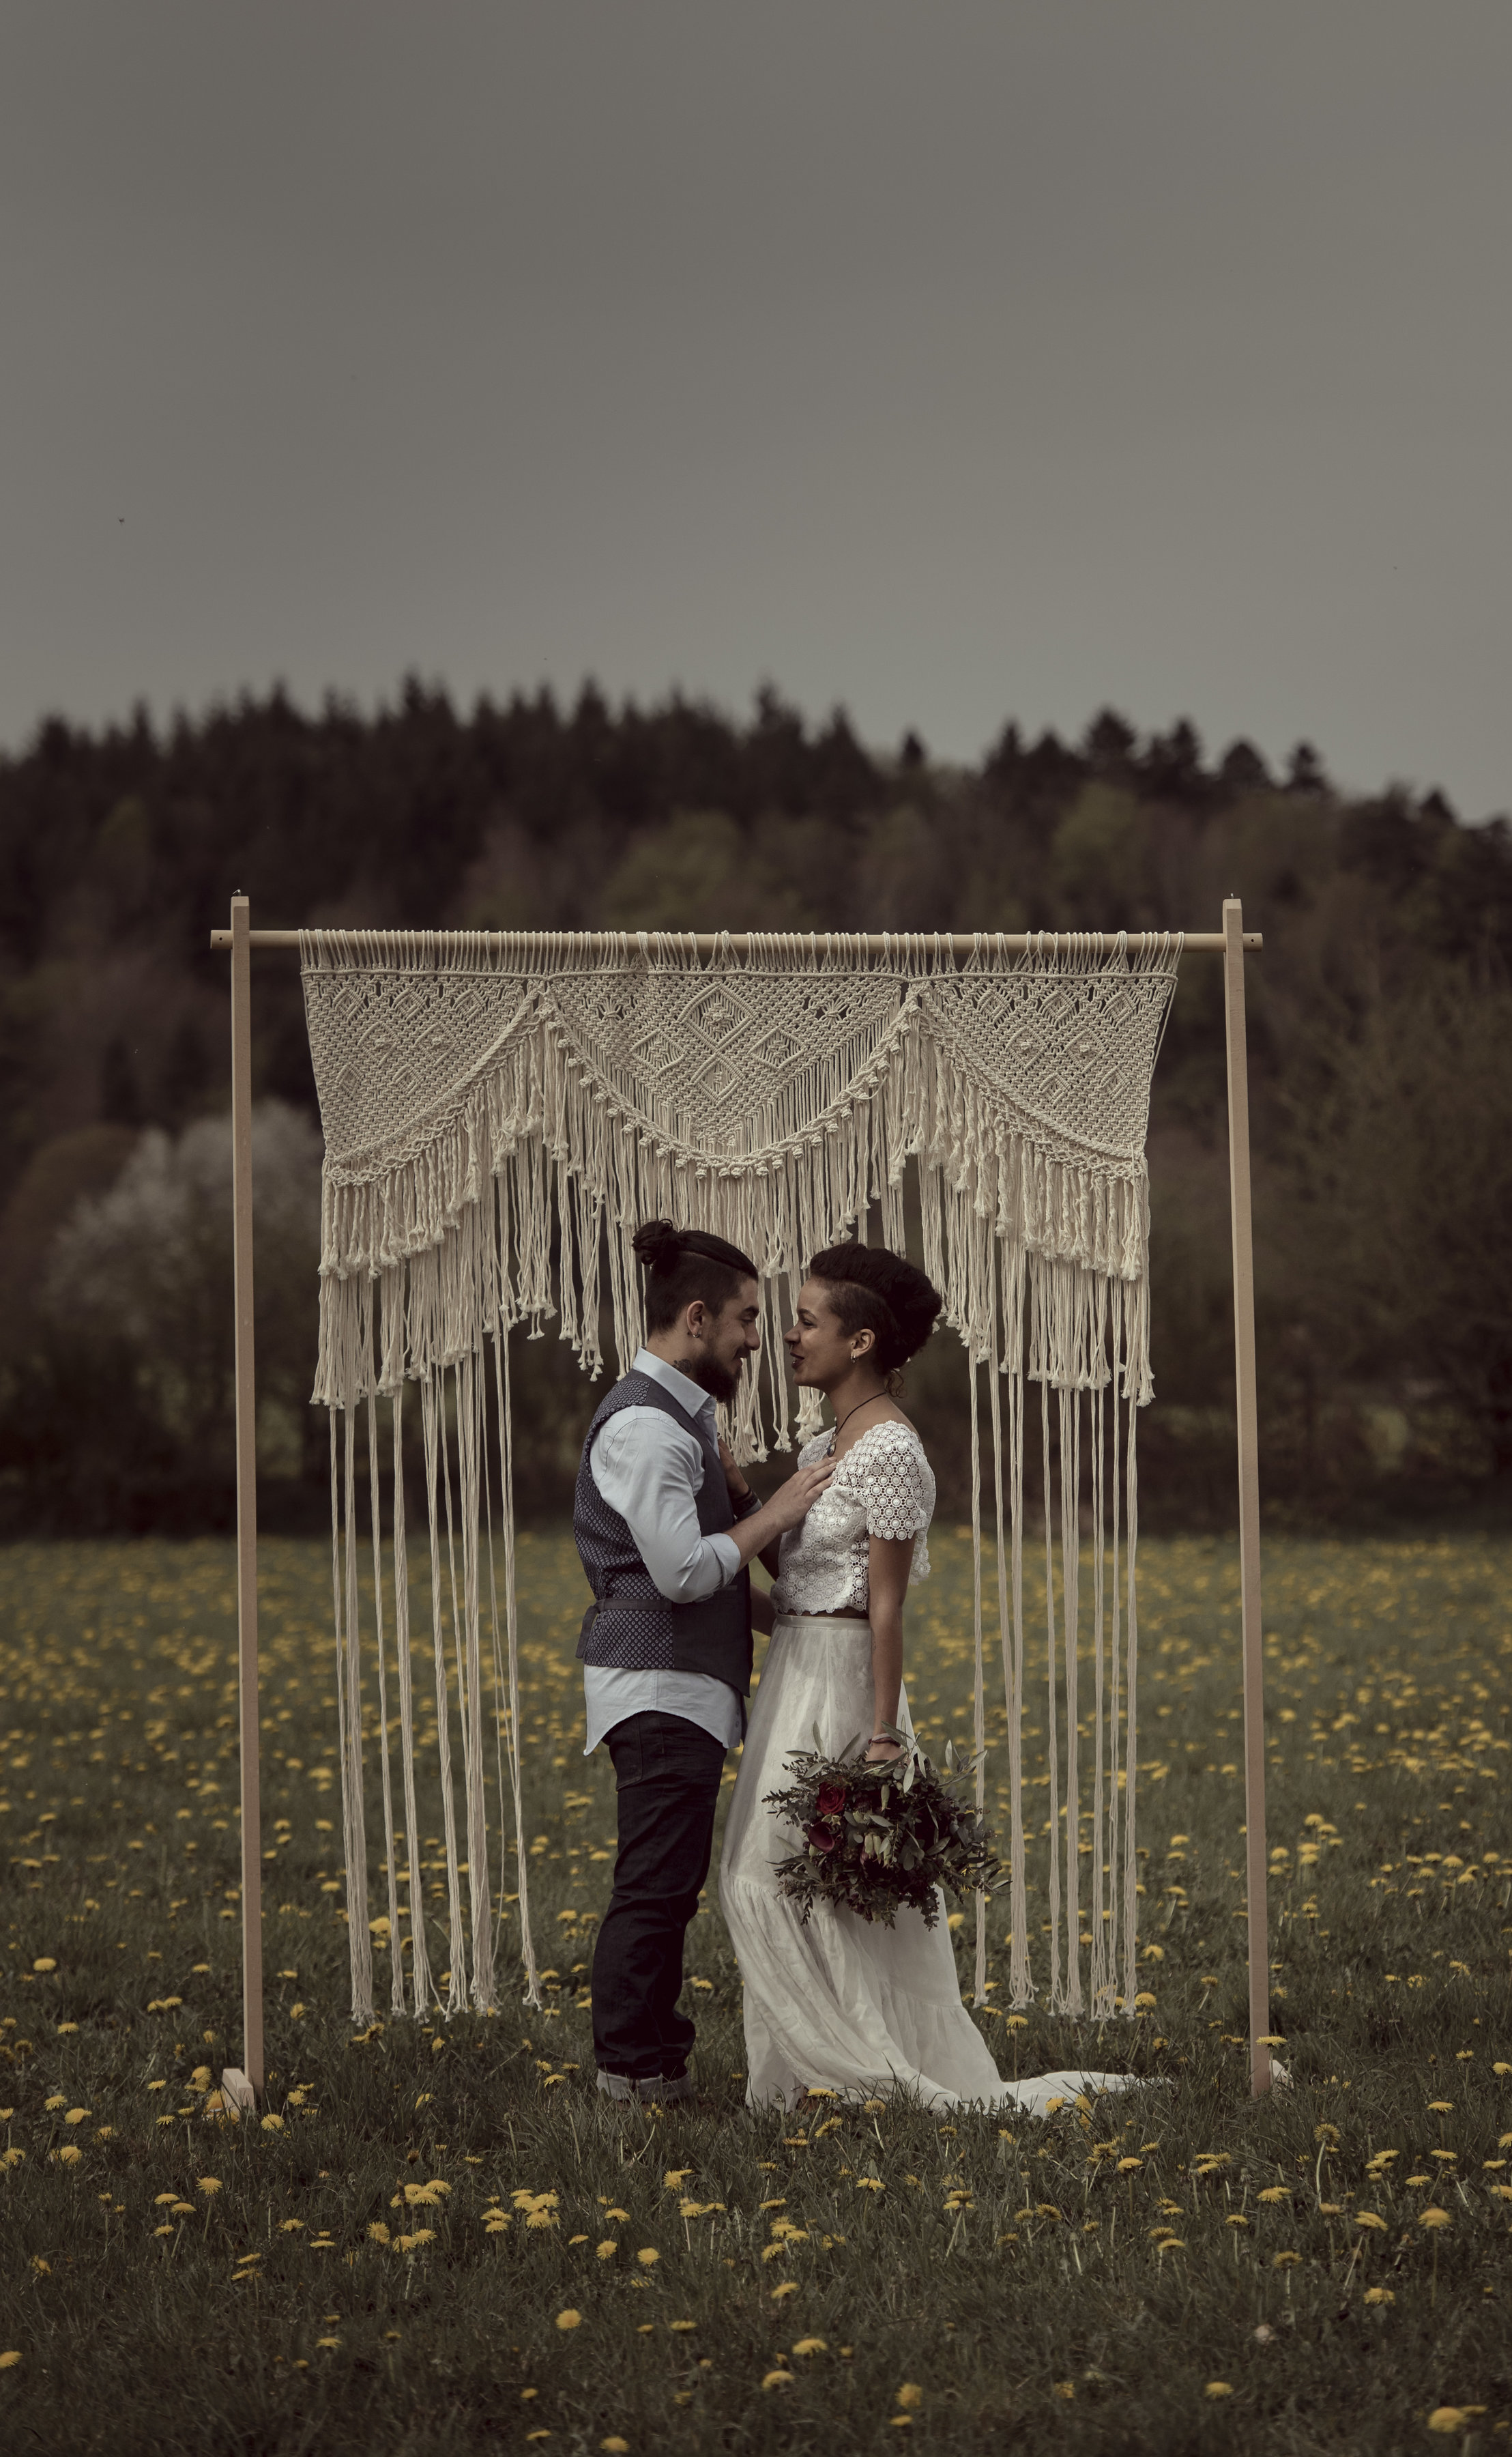 Arche en macramé mariage bohème